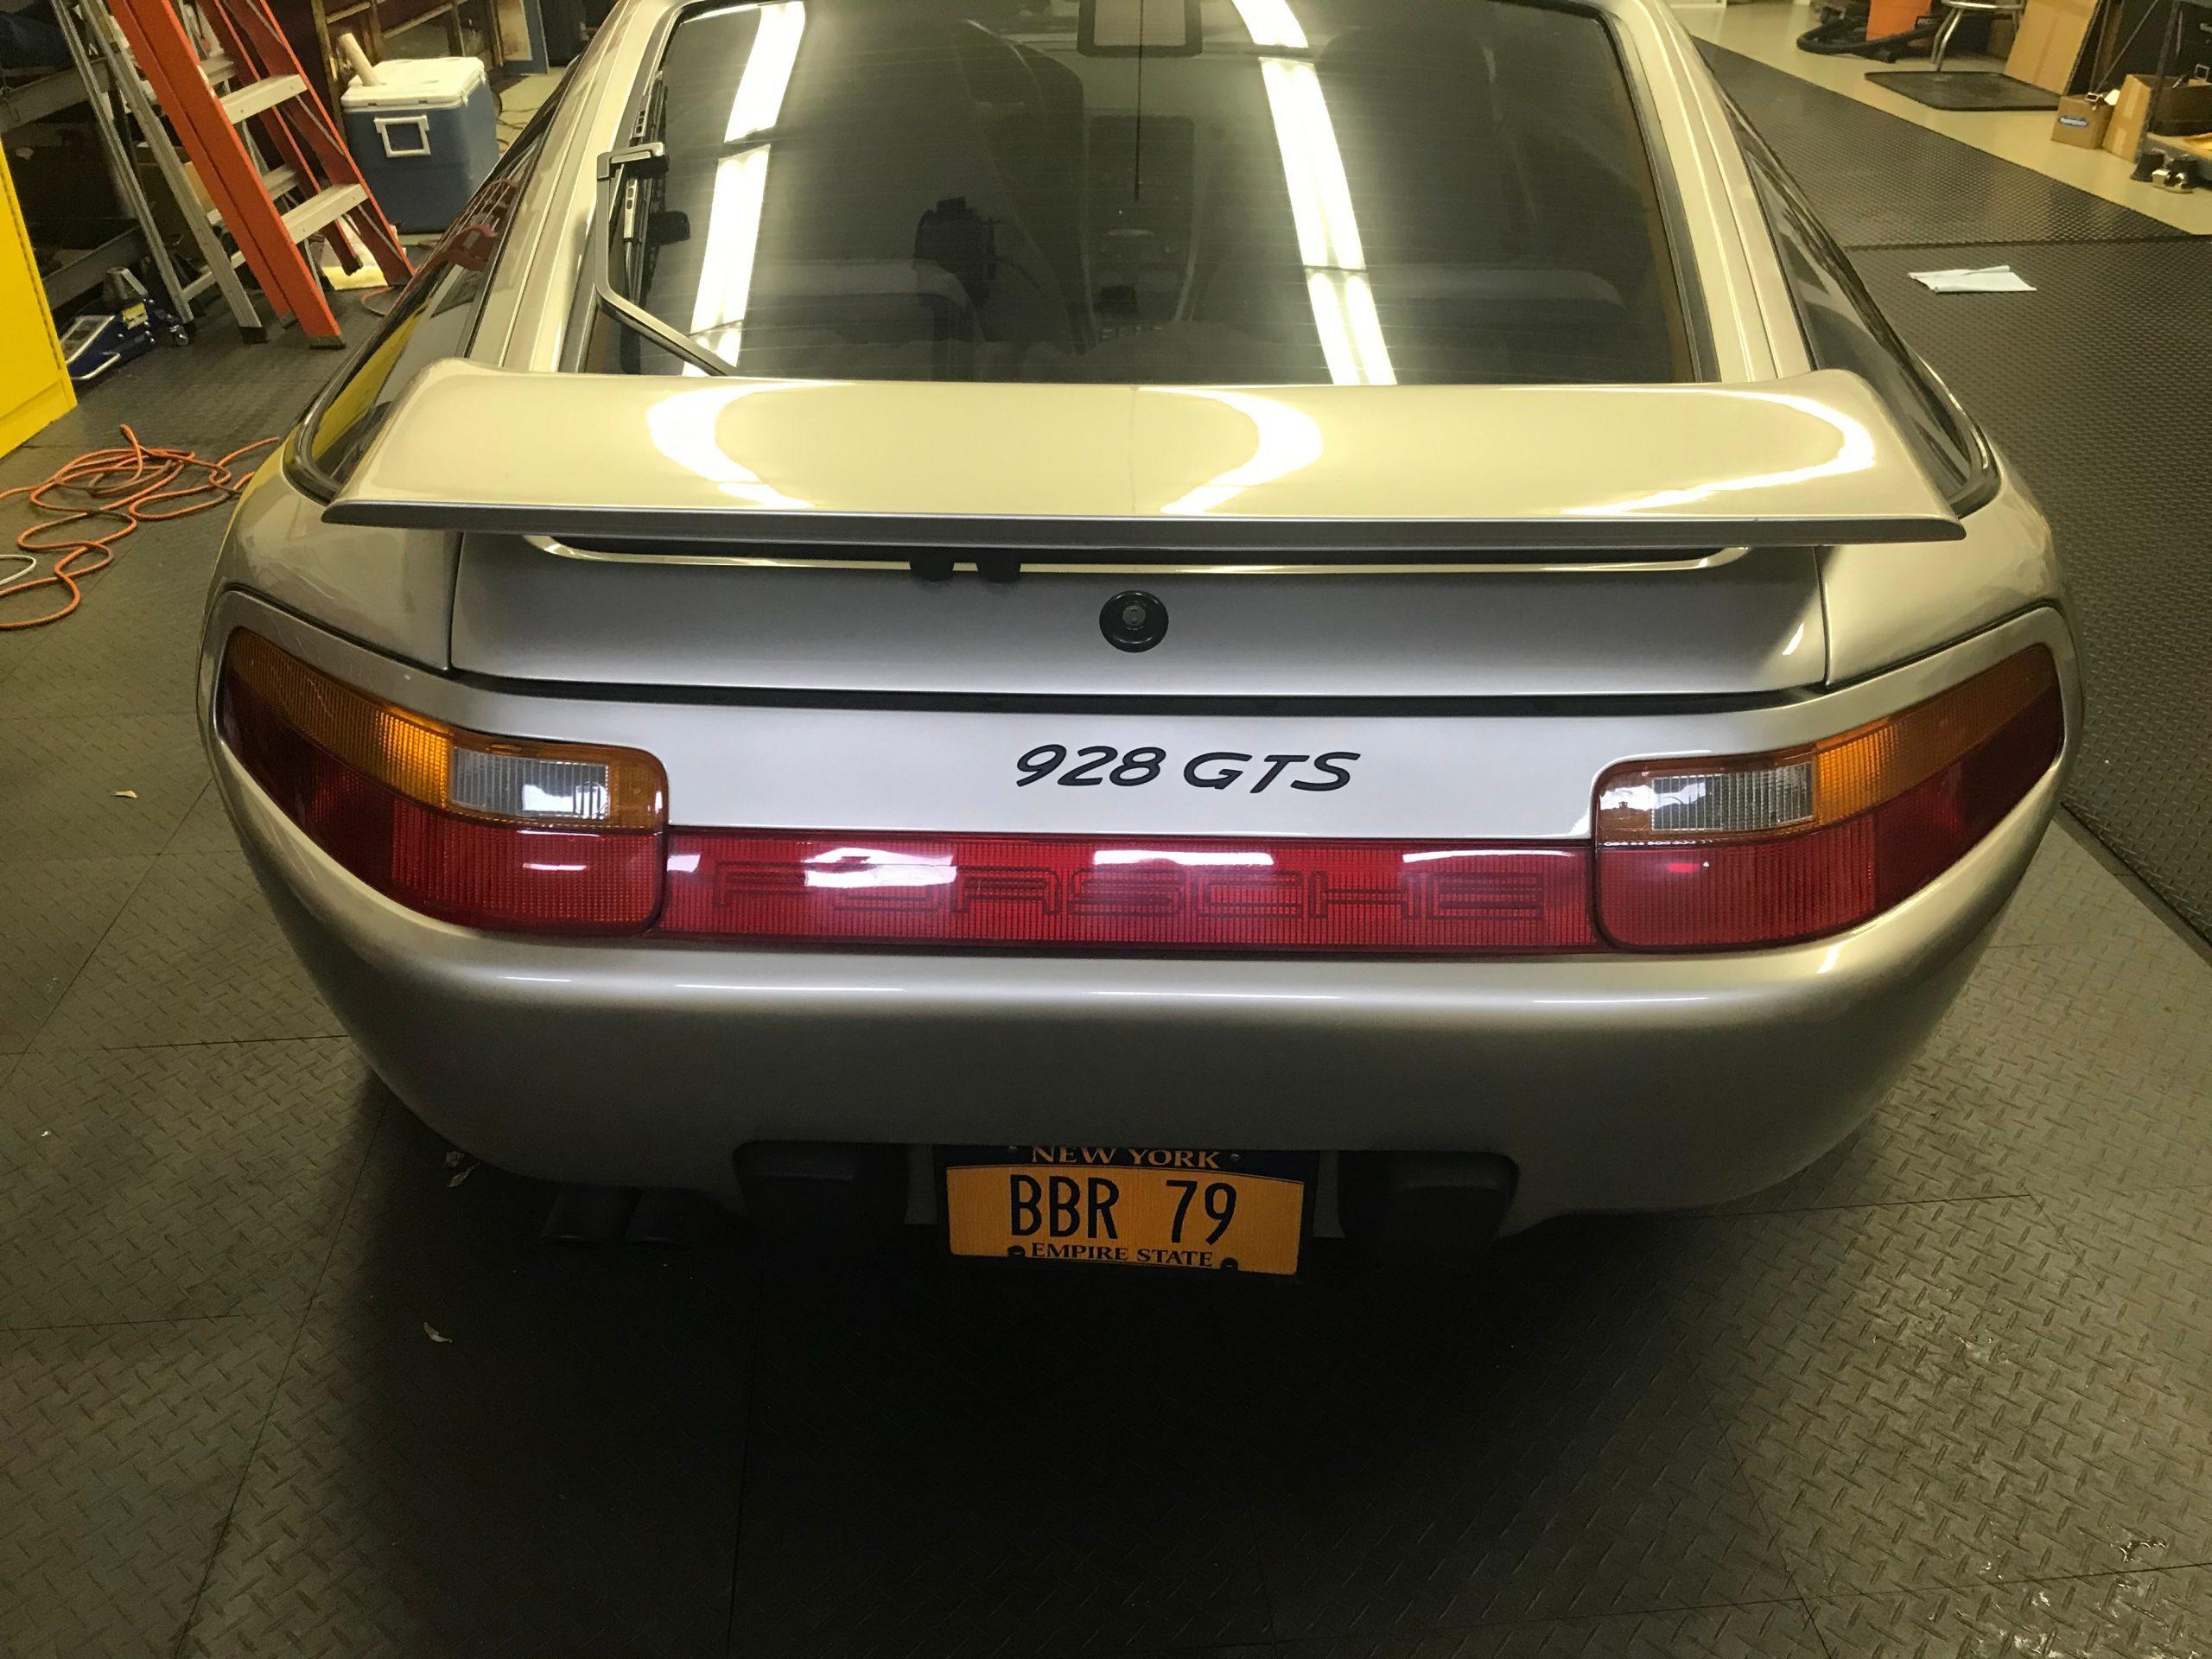 93 P928GTS - 4